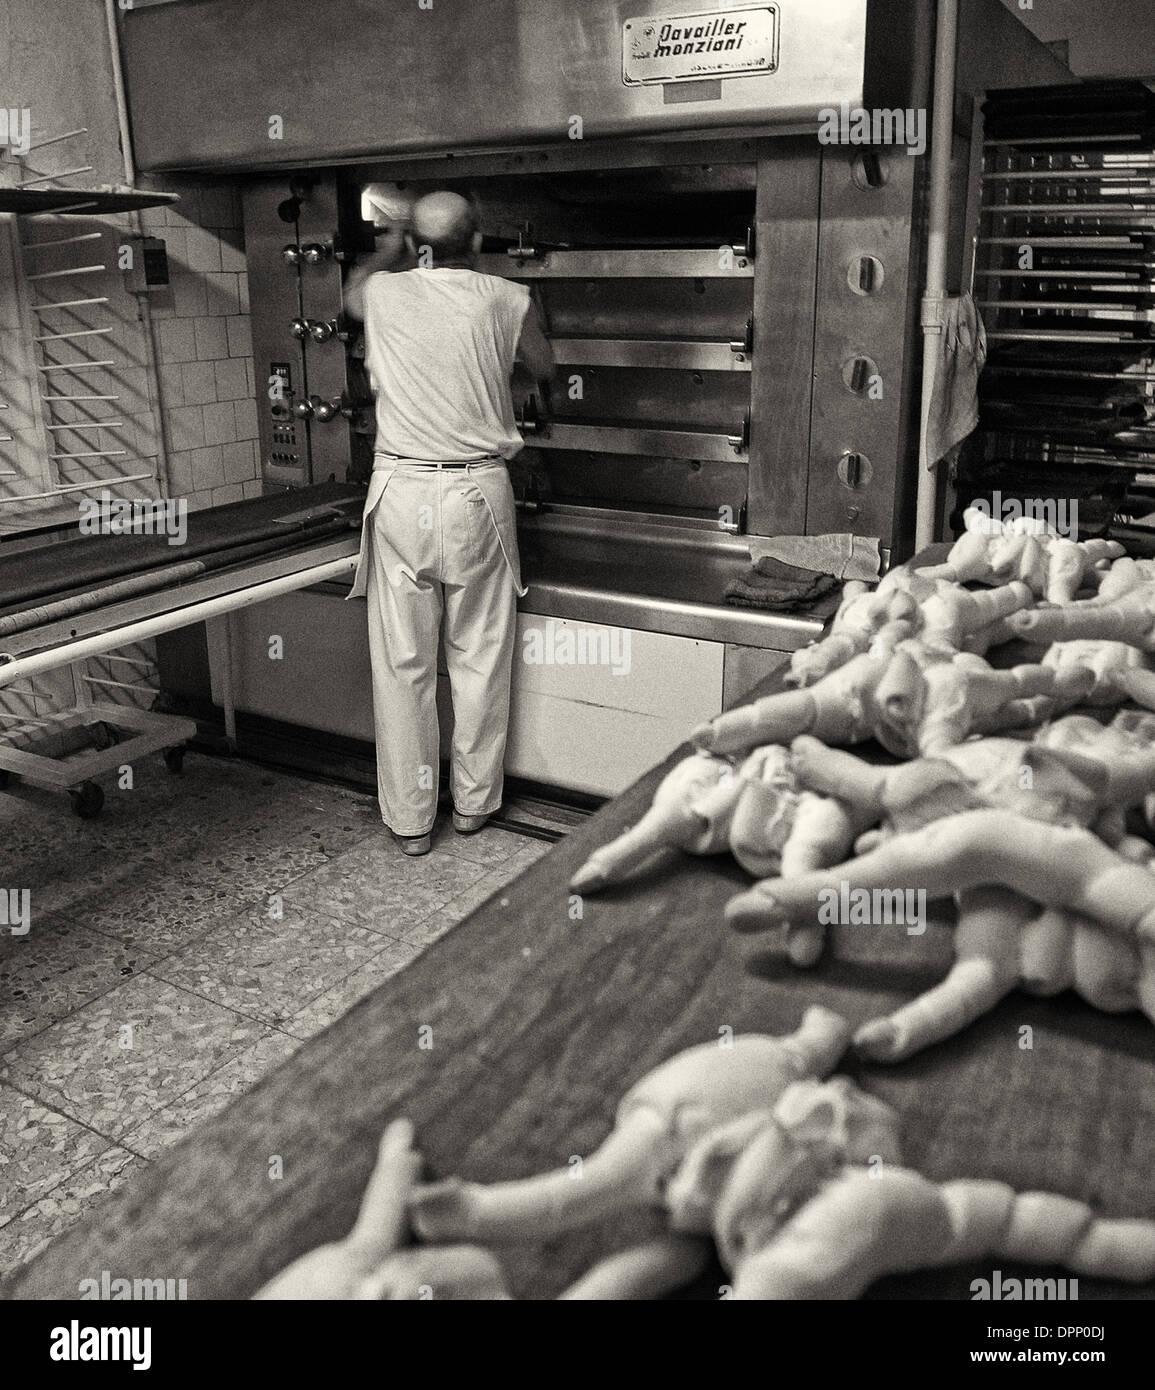 Coppia Ferrarese being made in Ferrara bakery - Stock Image